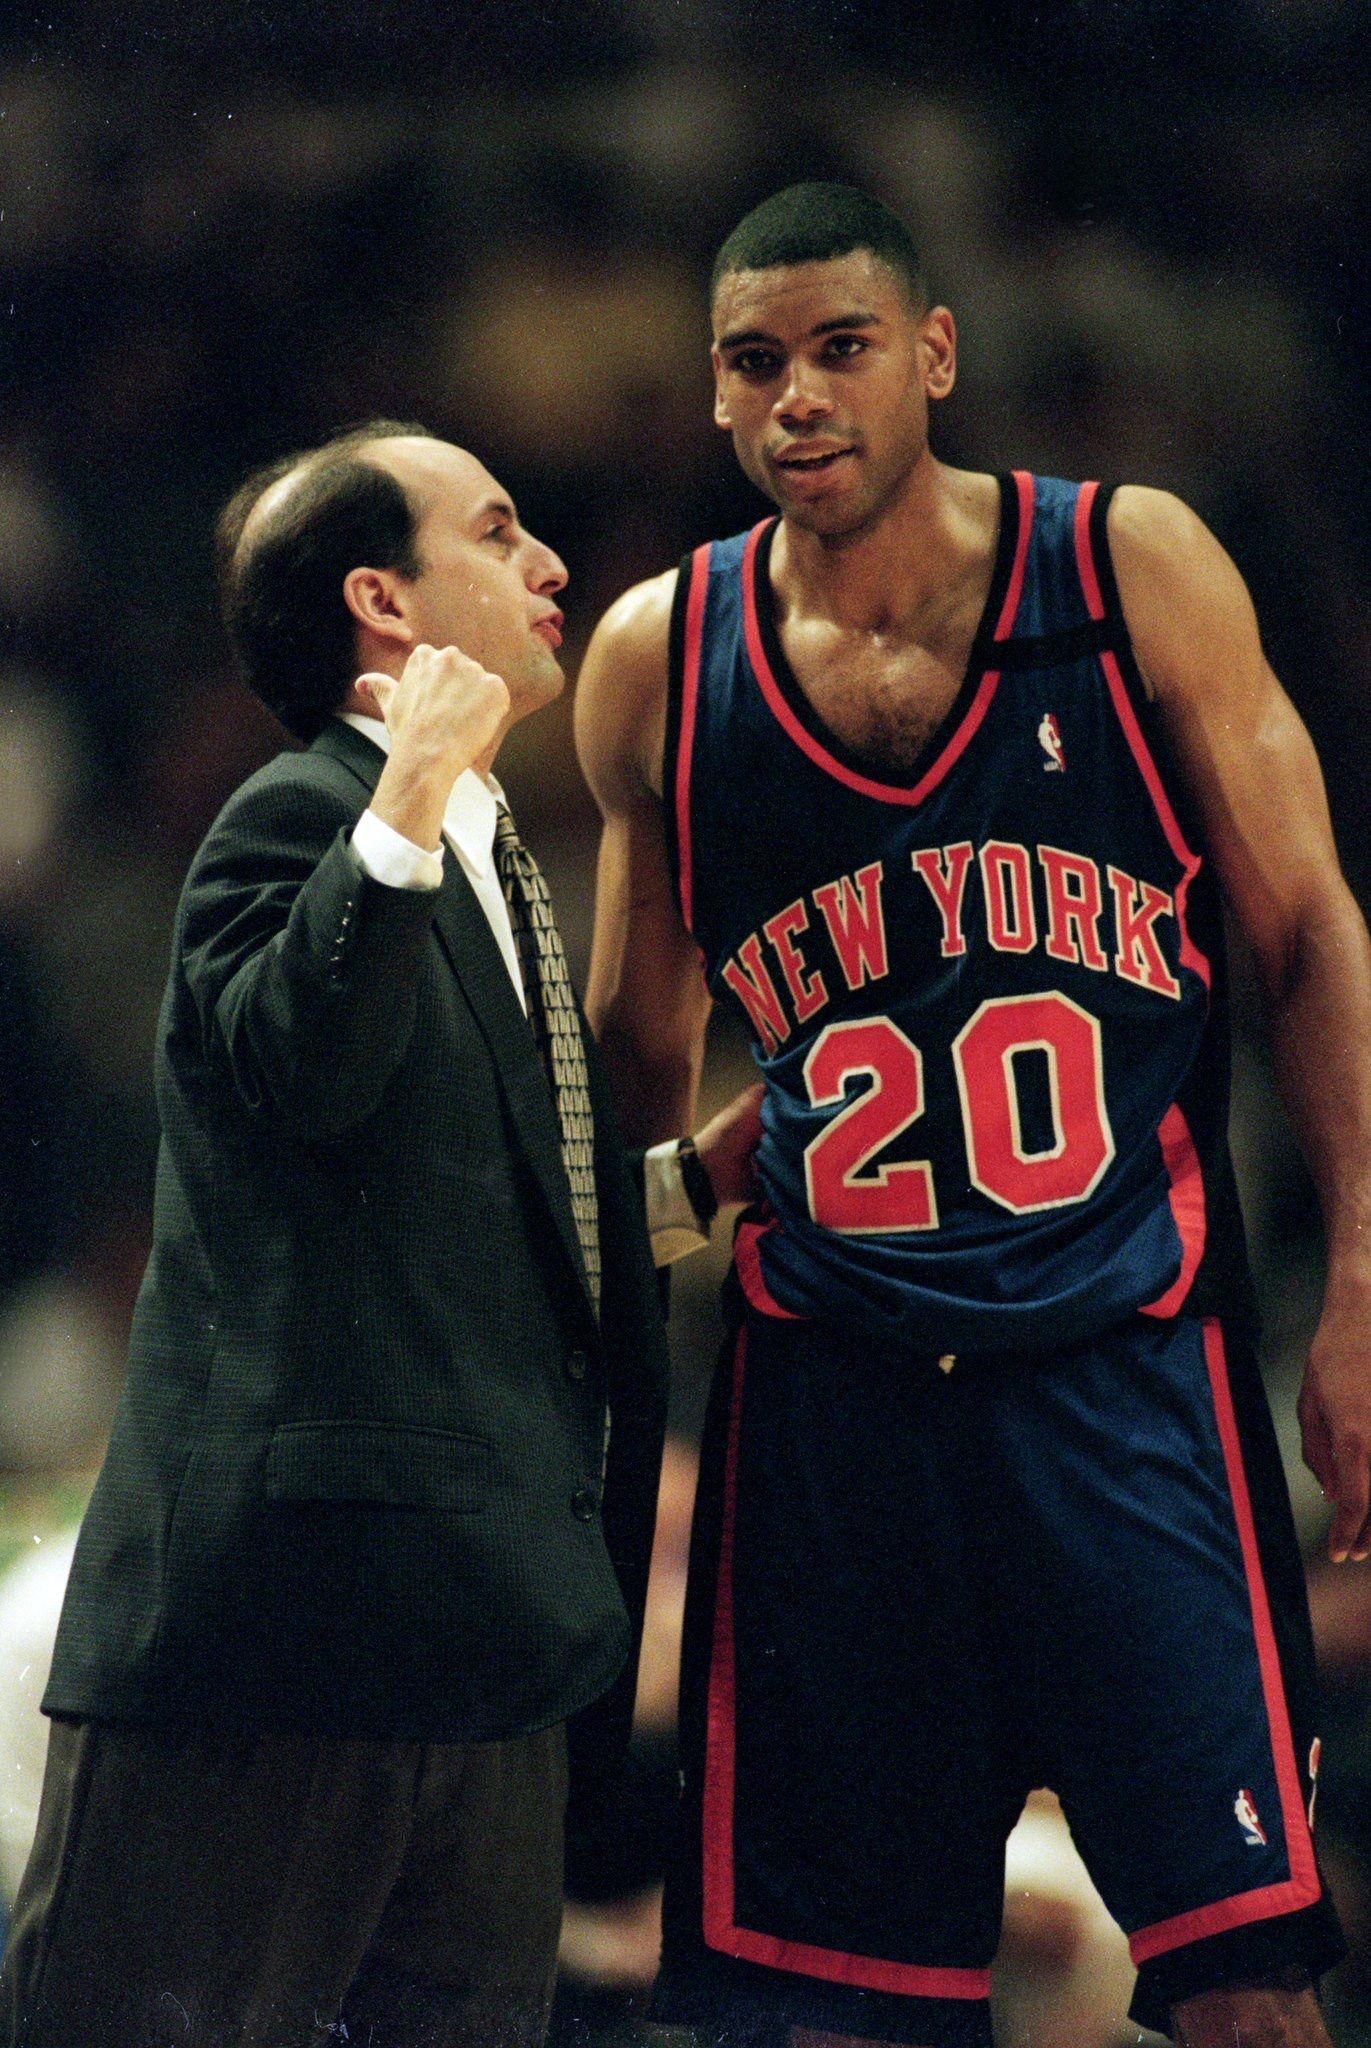 Allan Houston and Jeff Van Gundy New York Knicks